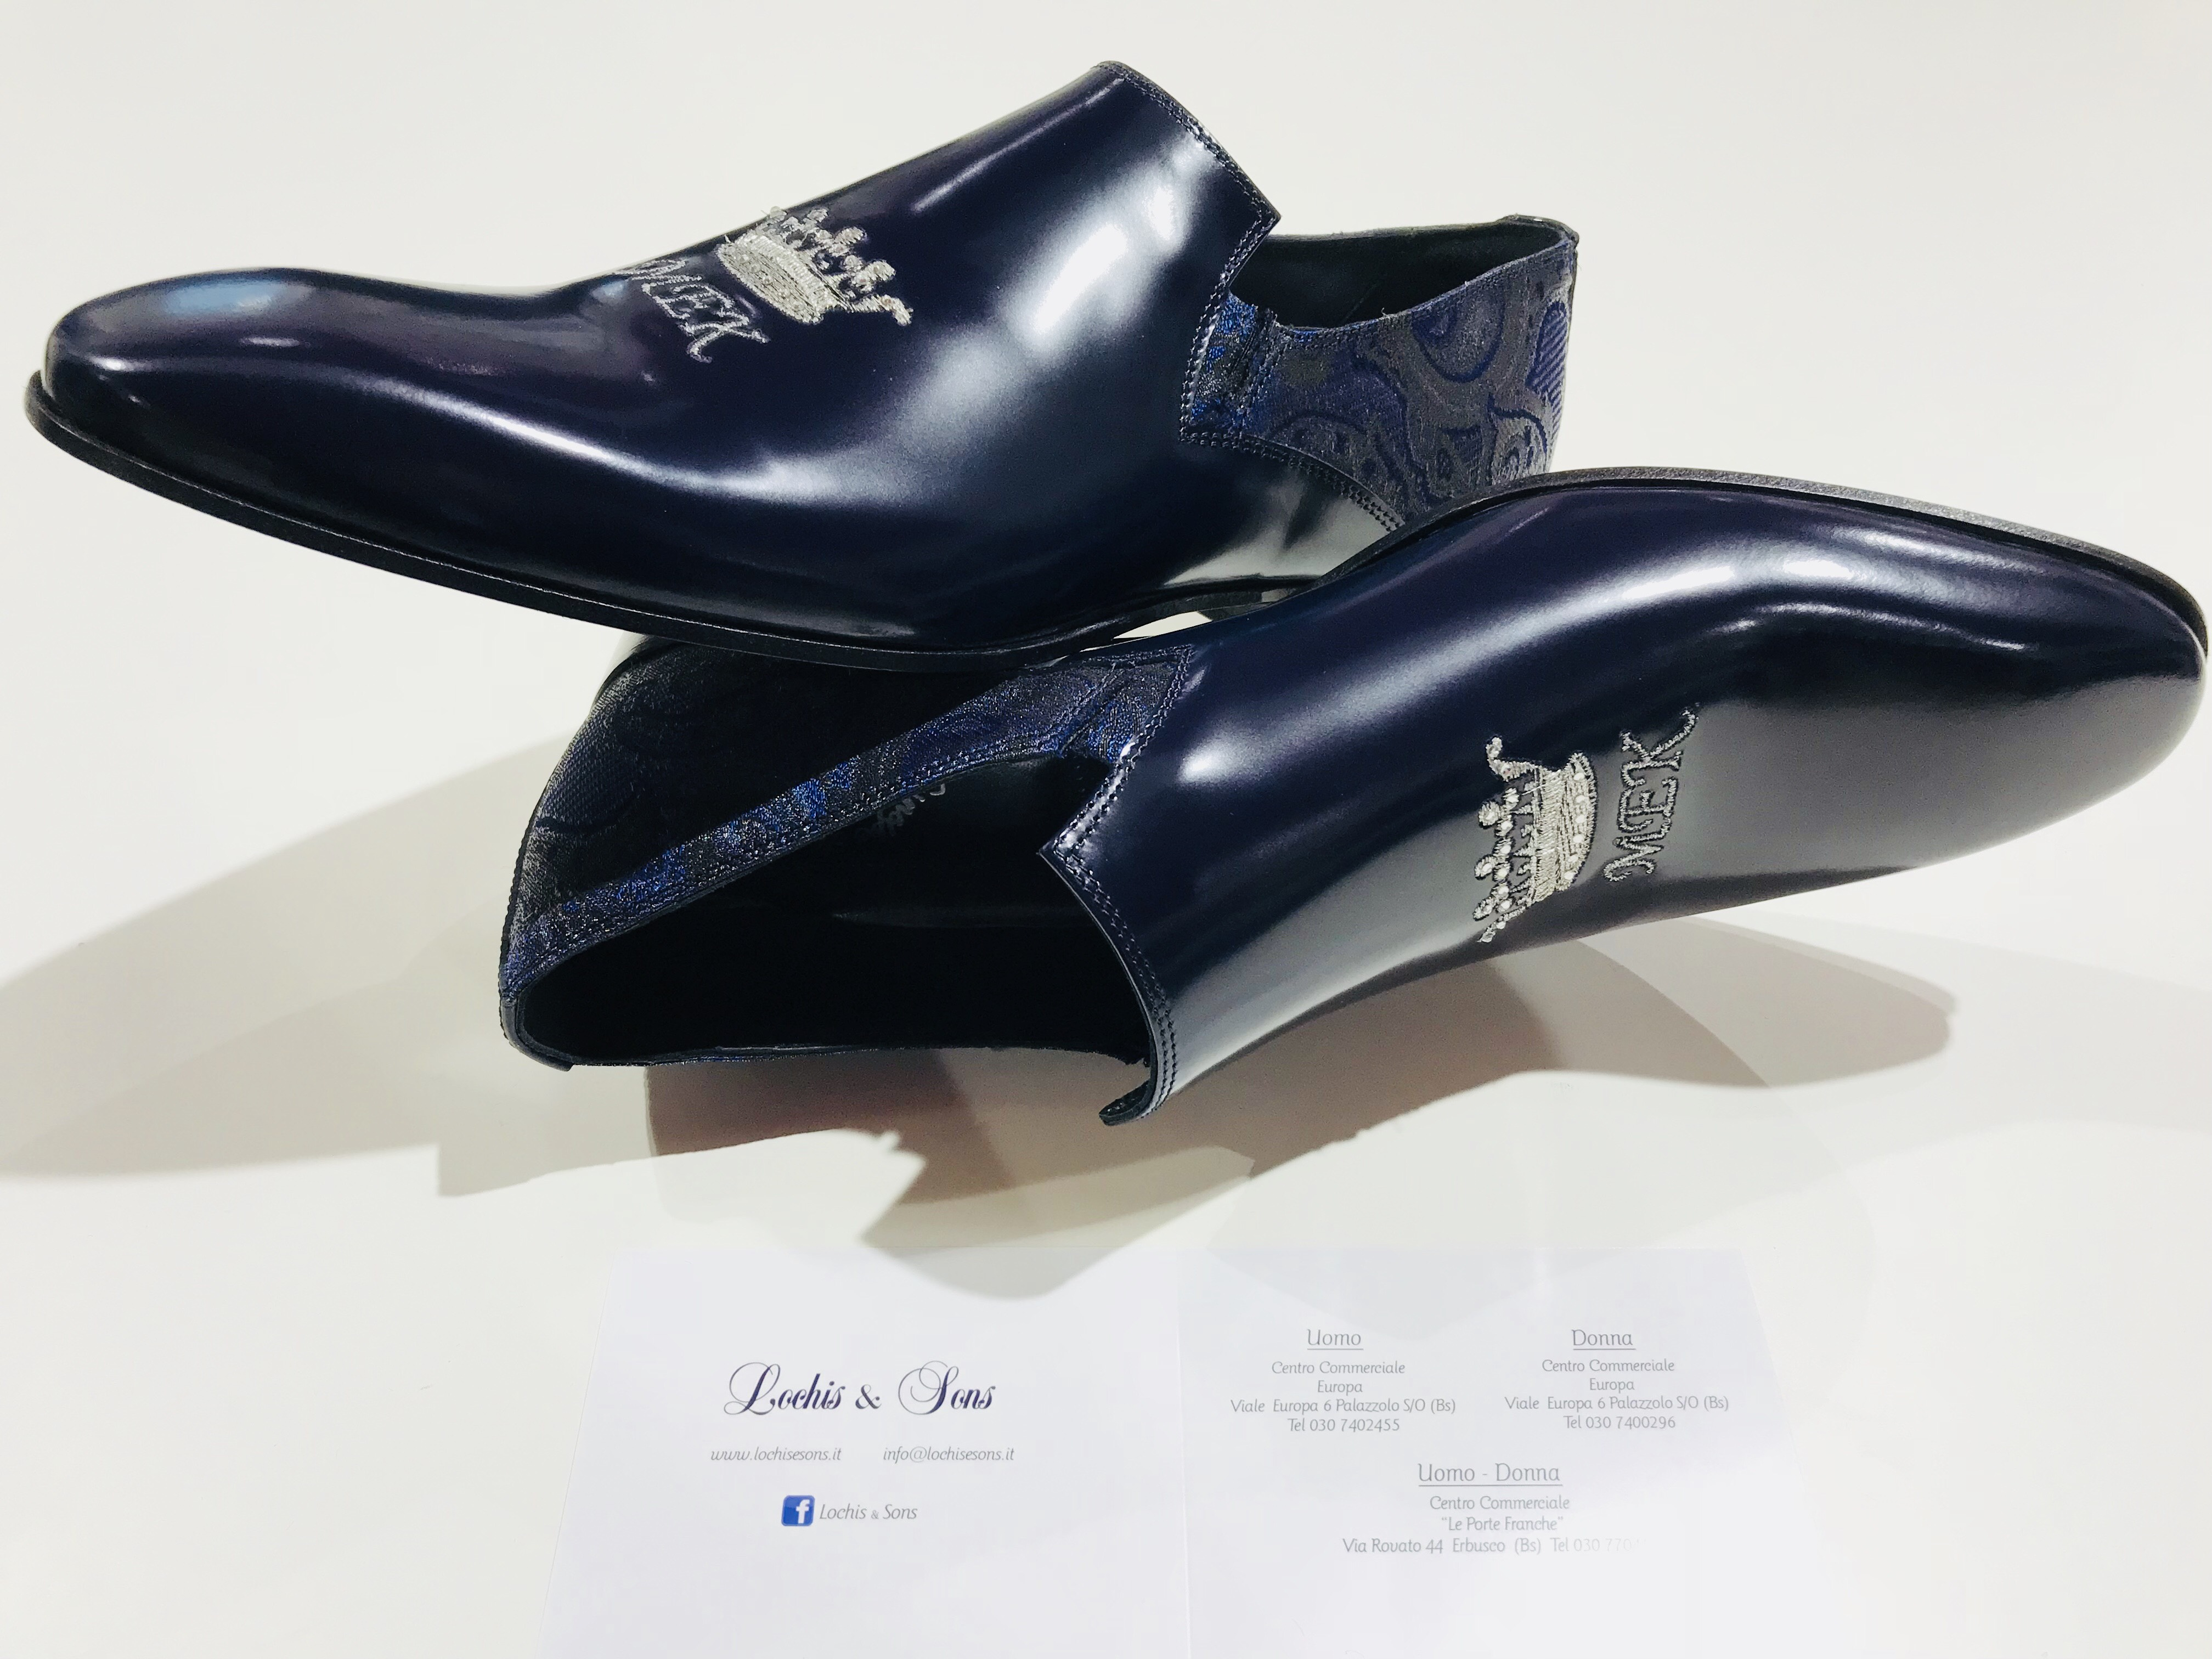 calzatura sposo 0f0ed95fbe8